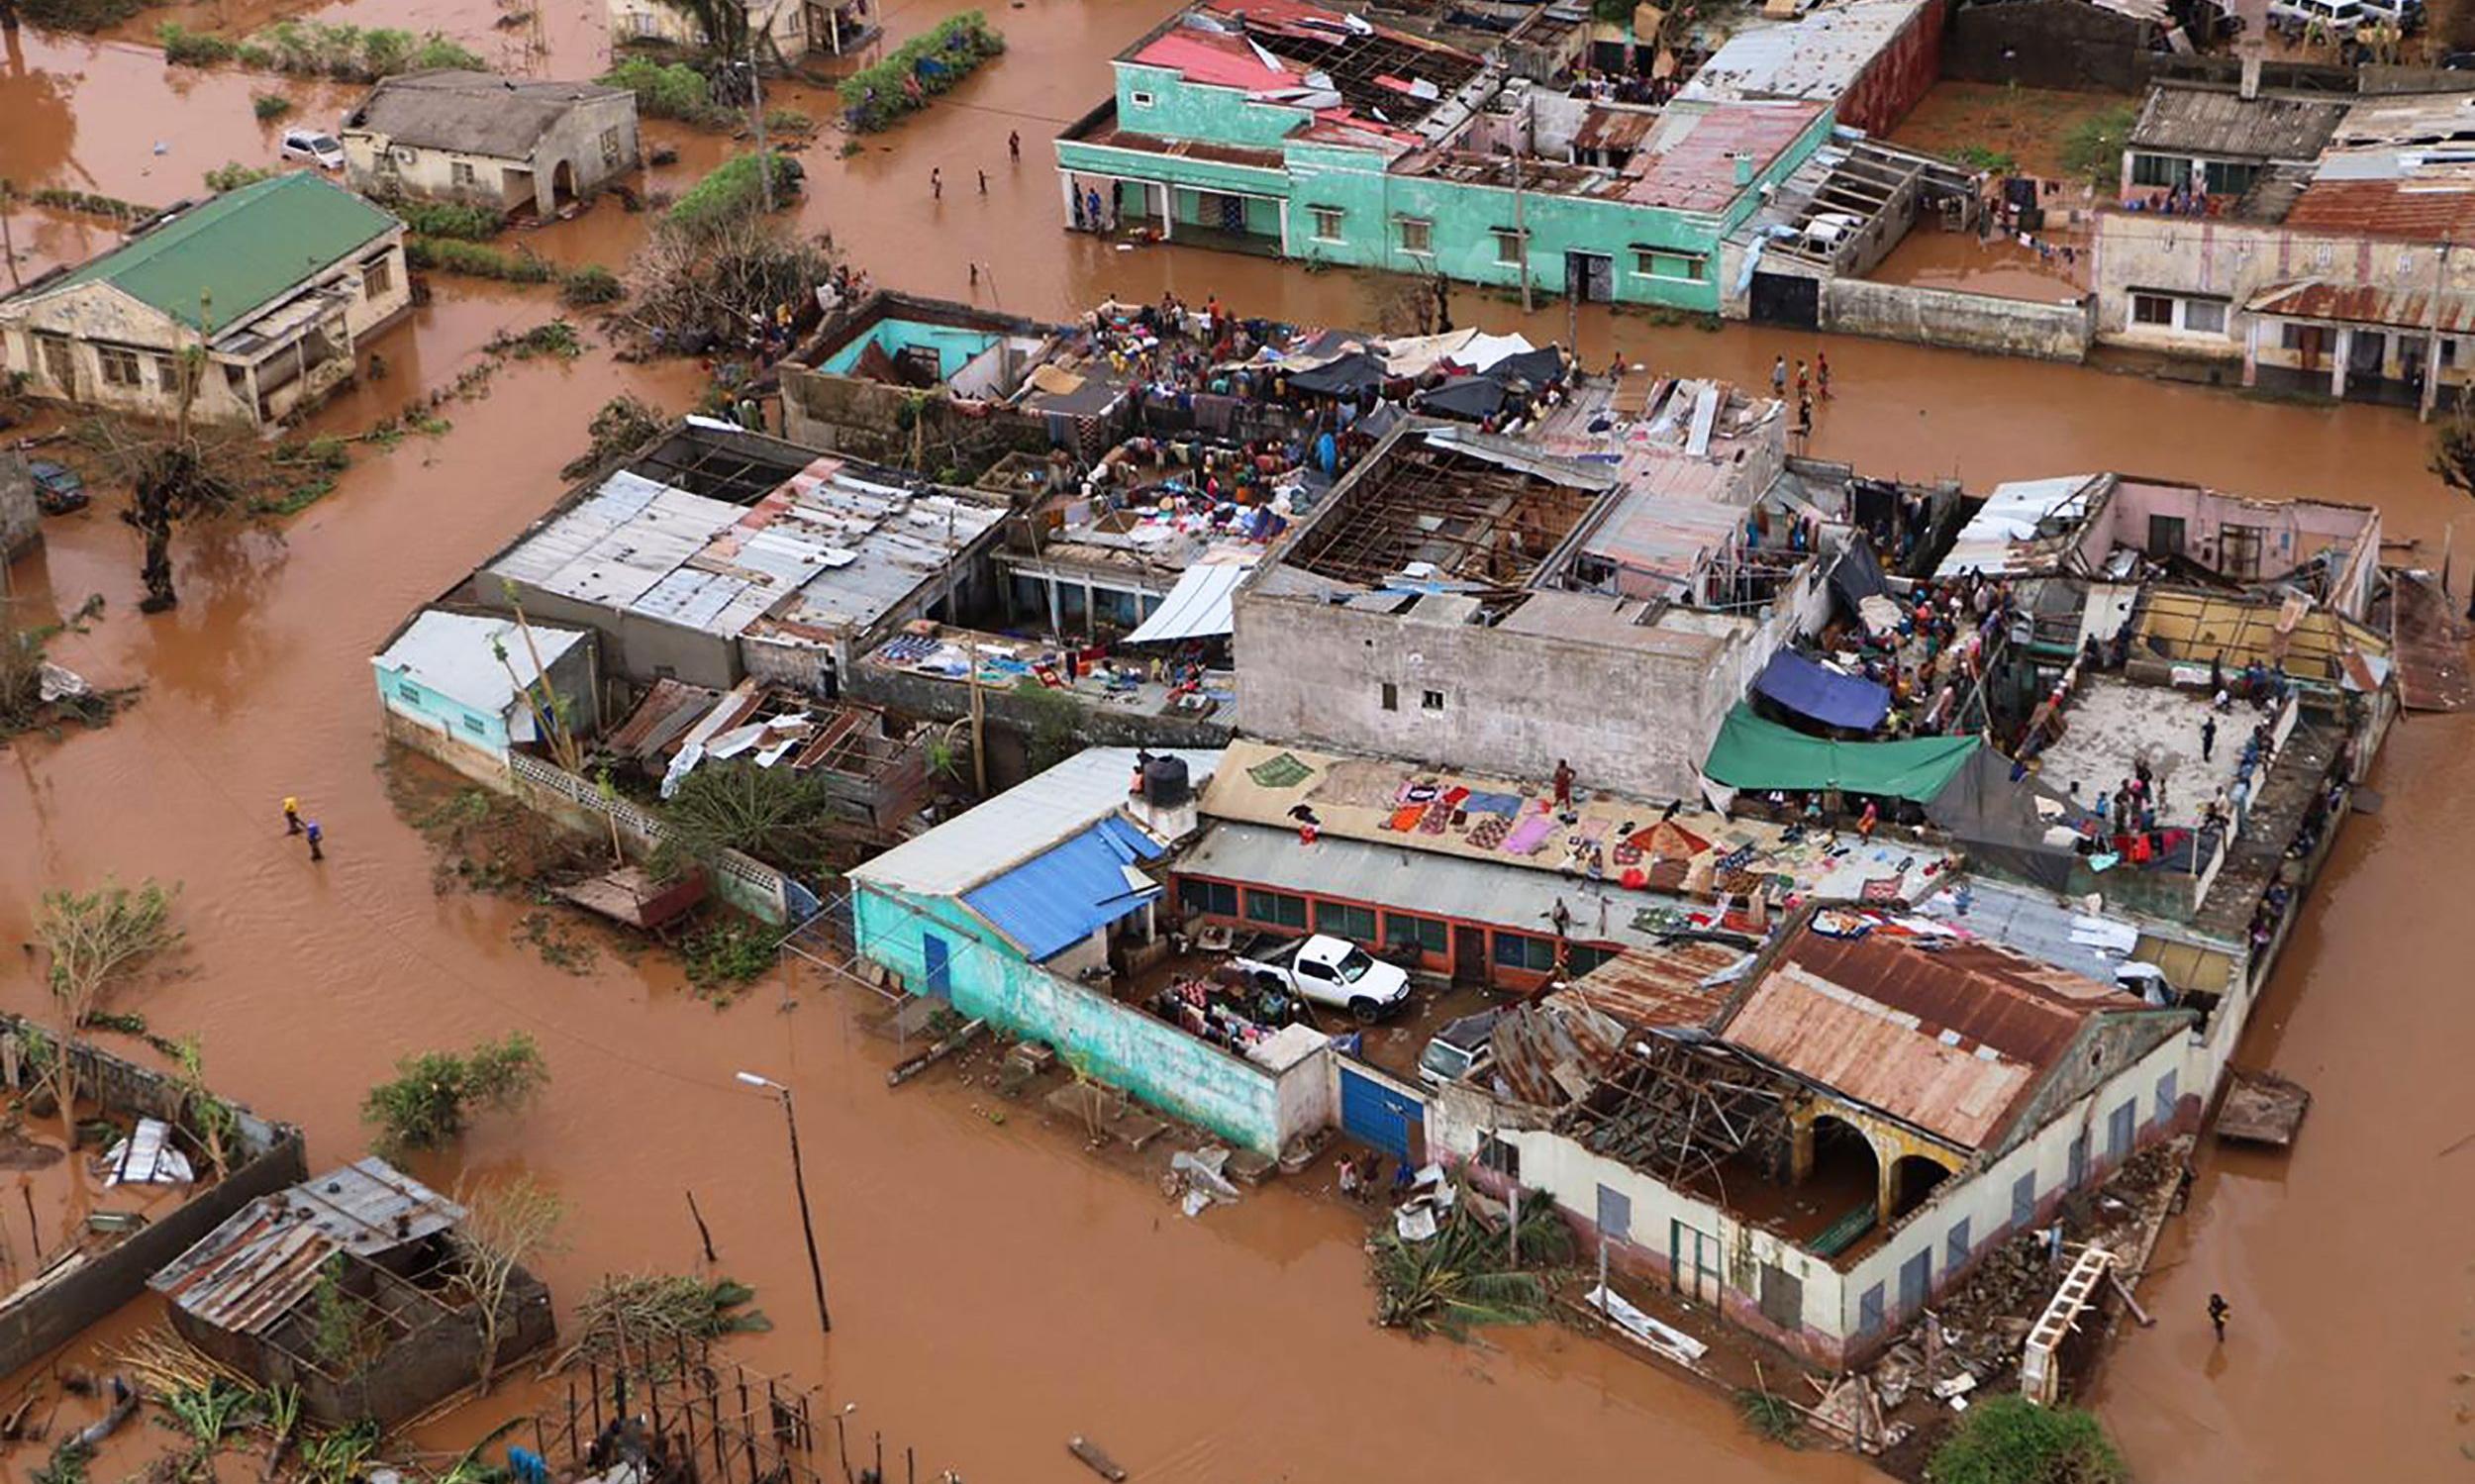 Mozambique rescue teams struggle to save thousands